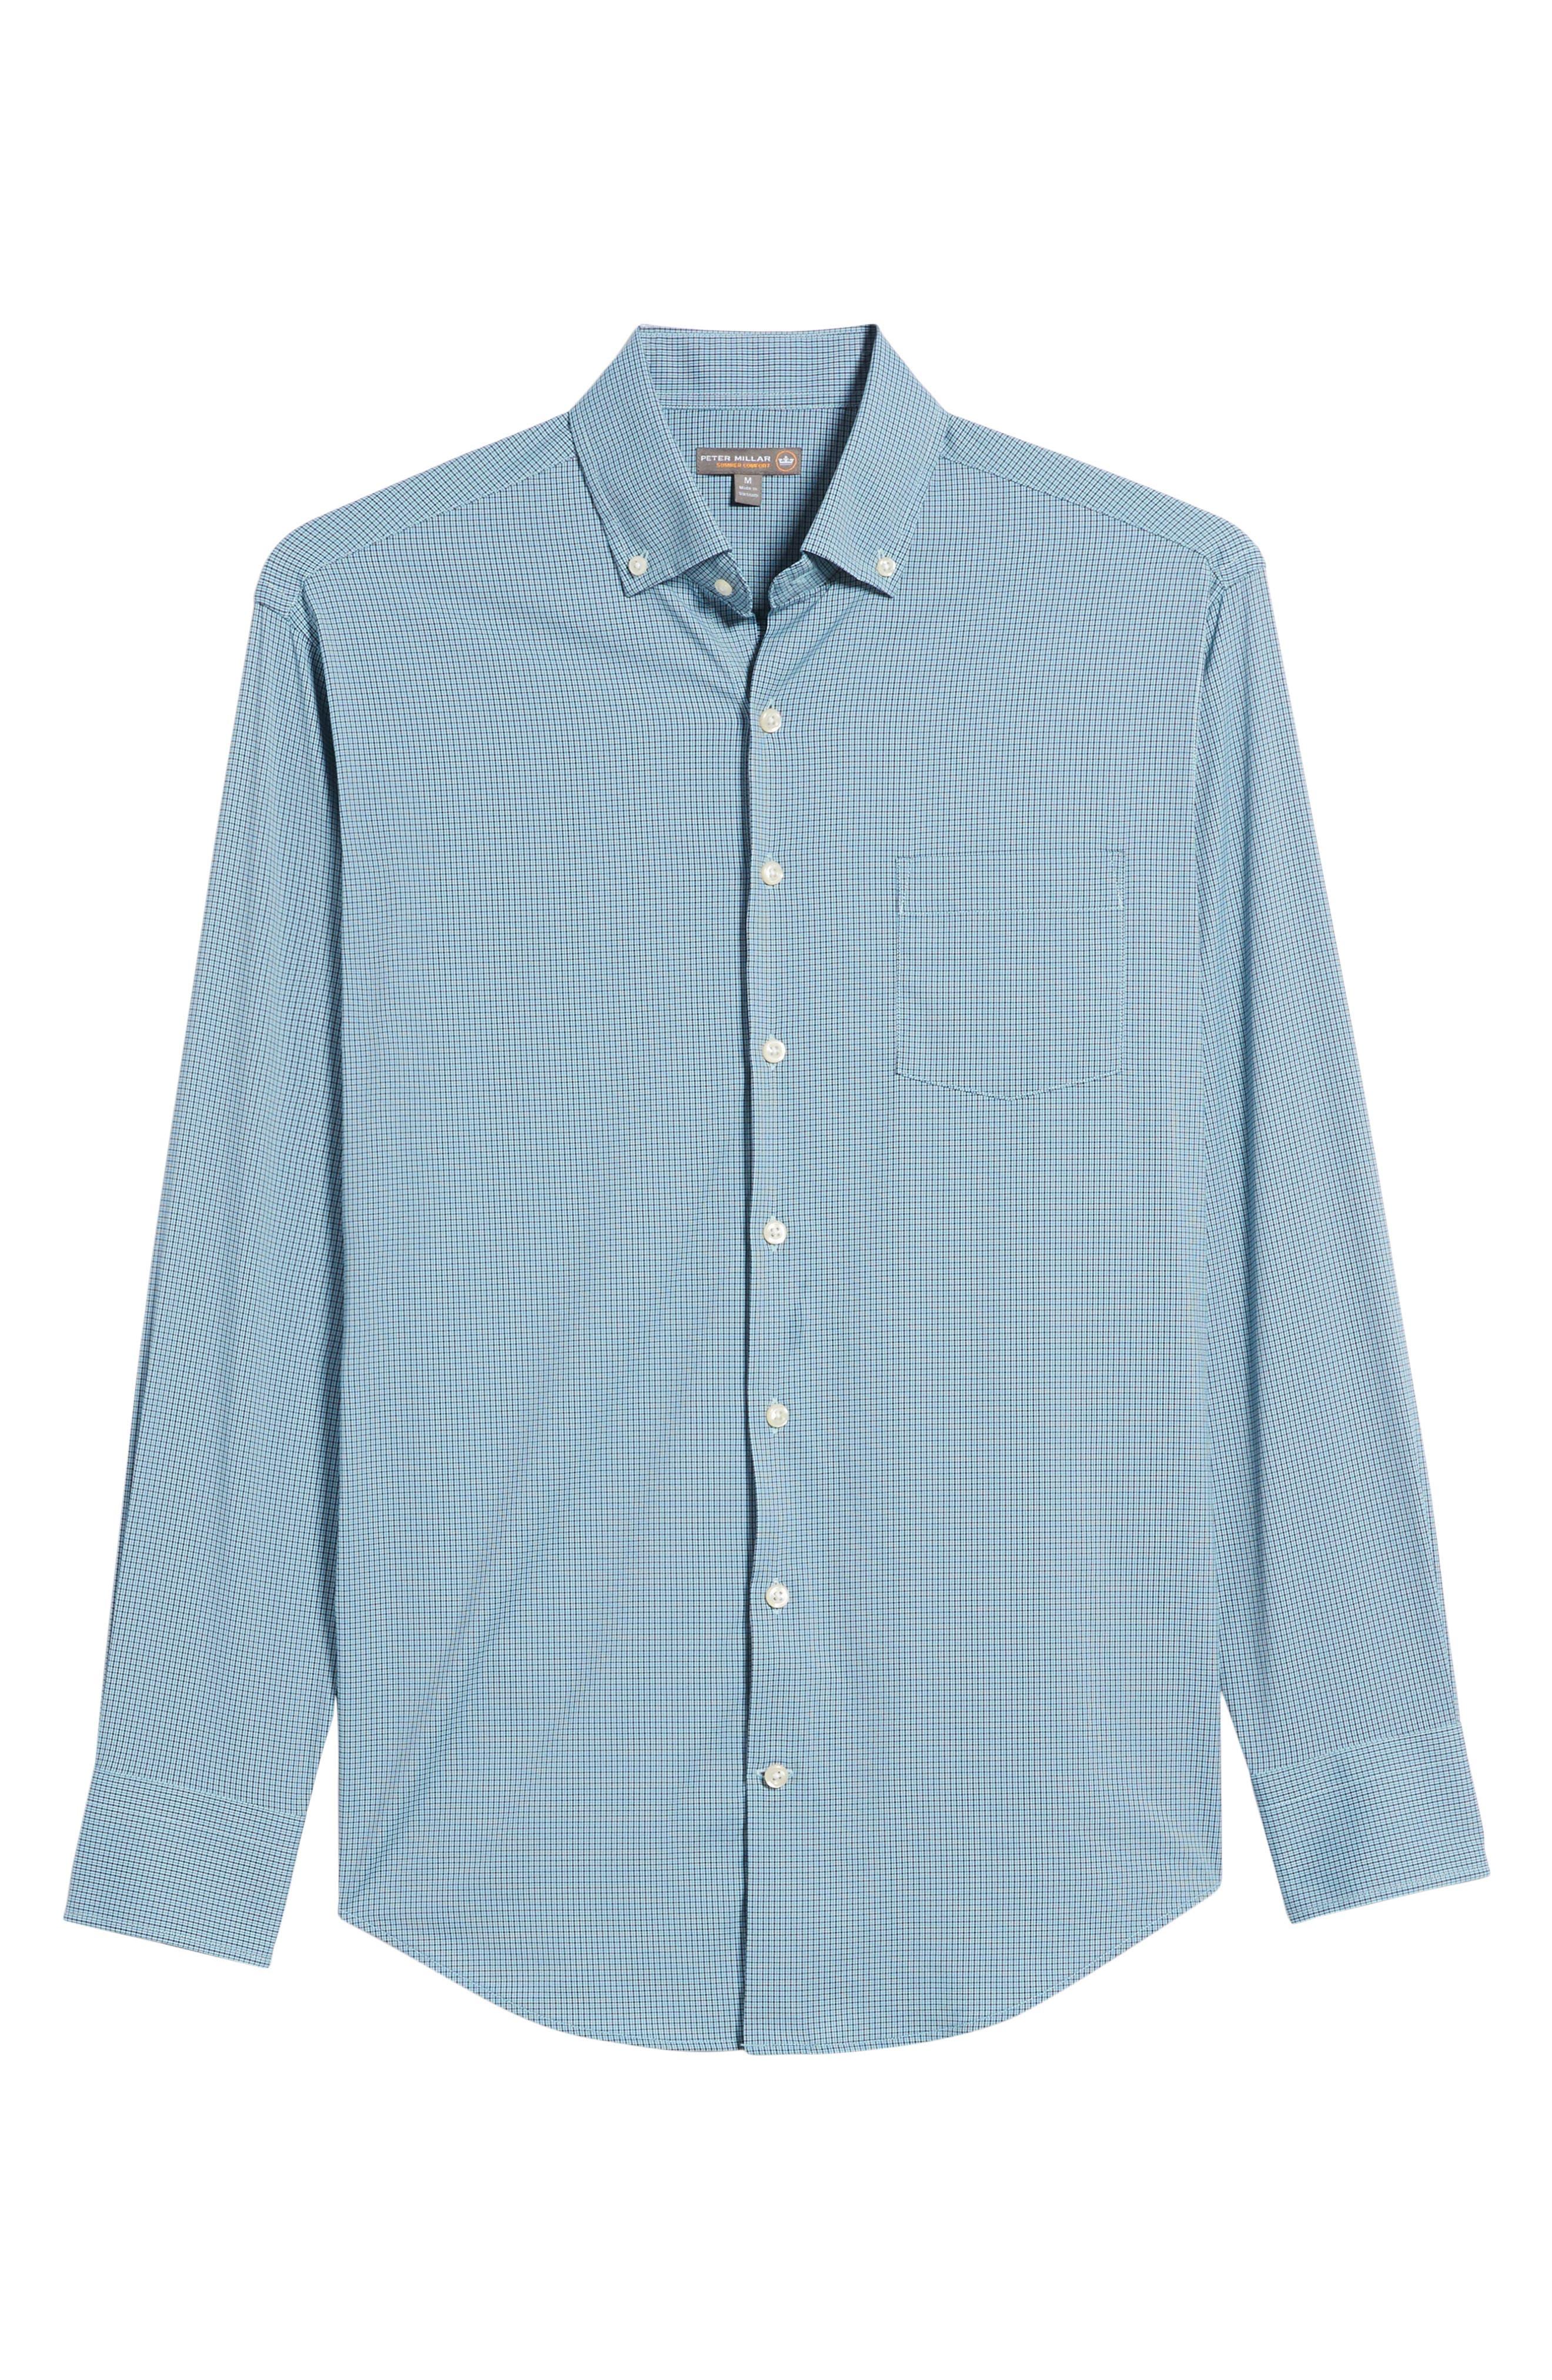 Parsons Regular Fit Performance Sport Shirt,                             Alternate thumbnail 6, color,                             Grotto Blue